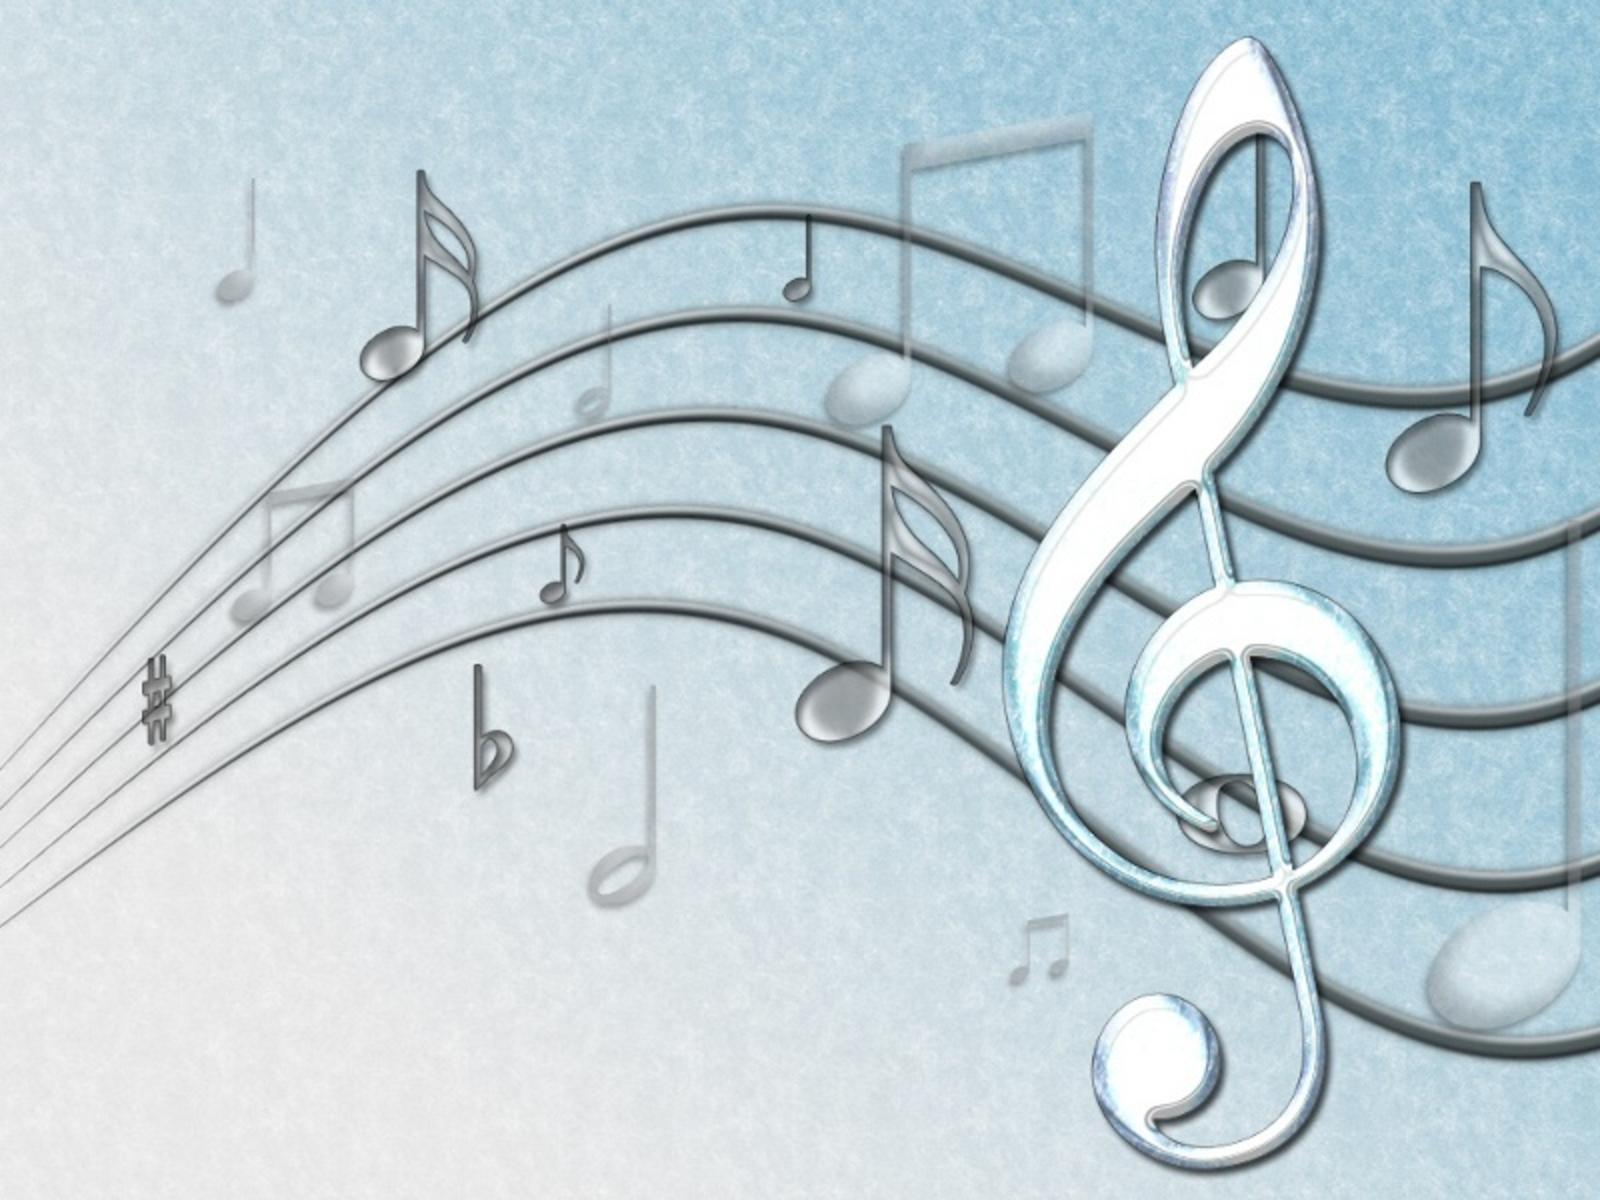 musical notes wallpaper - photo #18